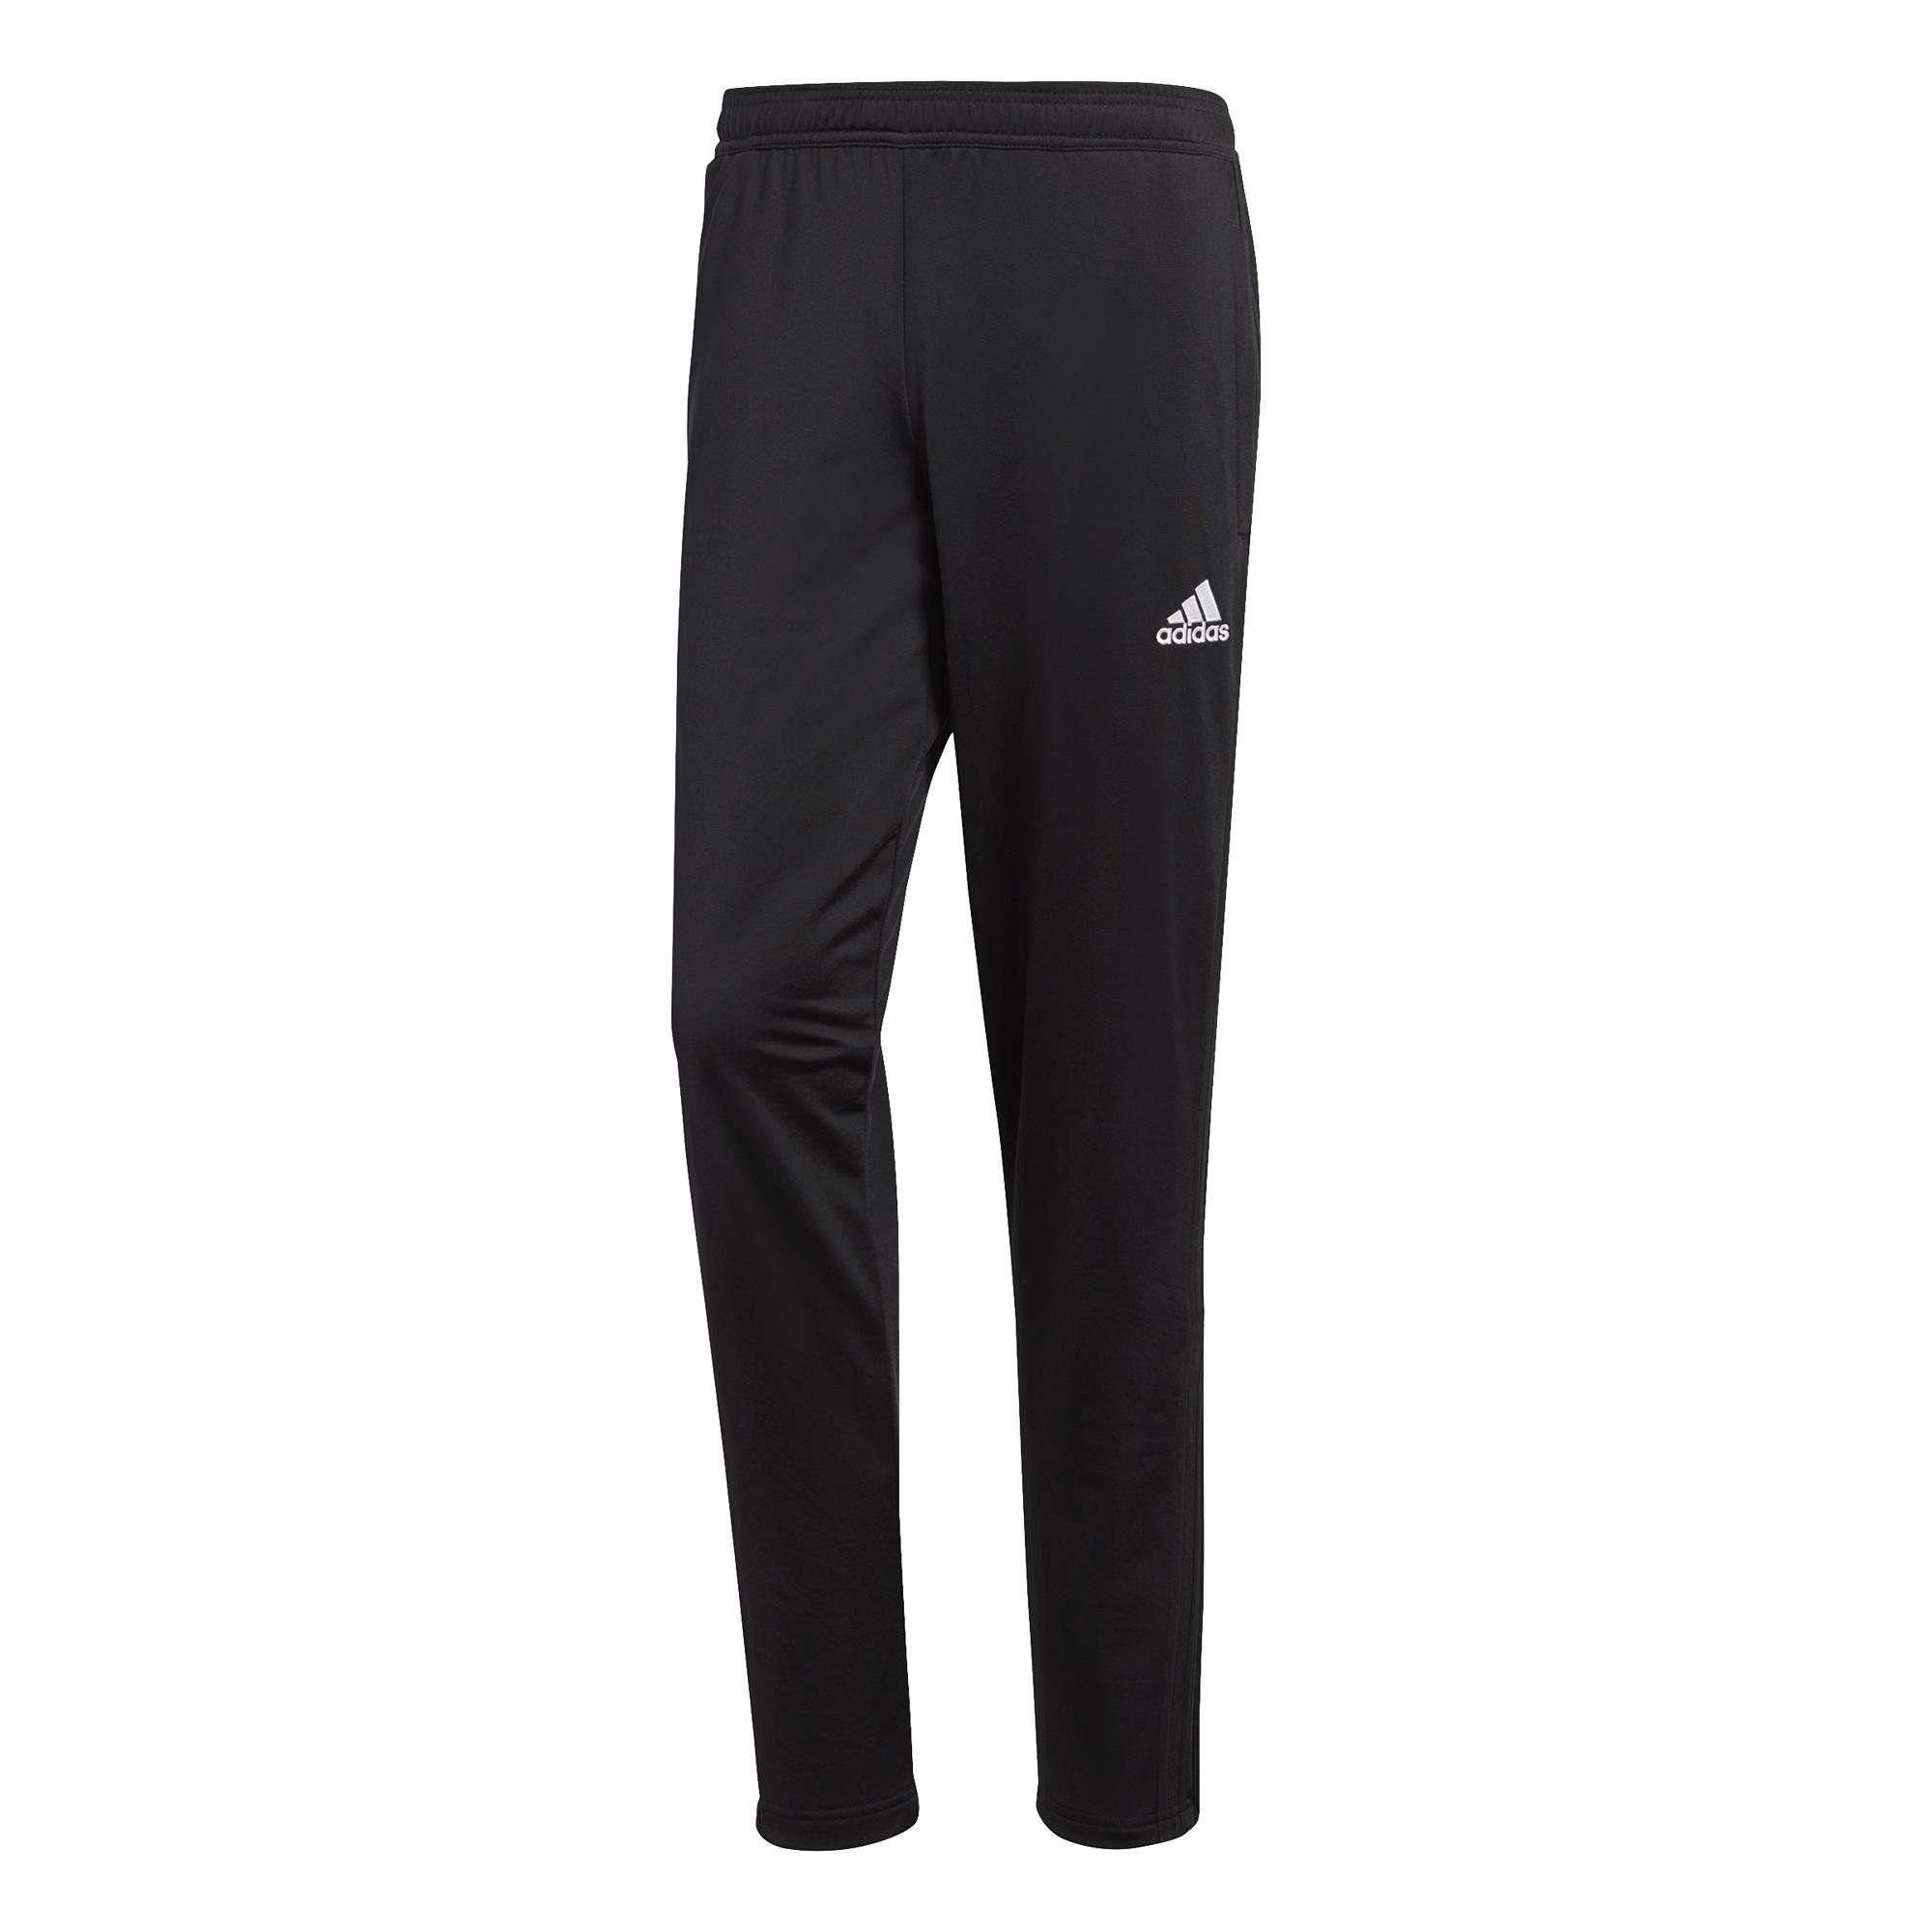 ADIDAS polyesterové kalhoty Condivo 18